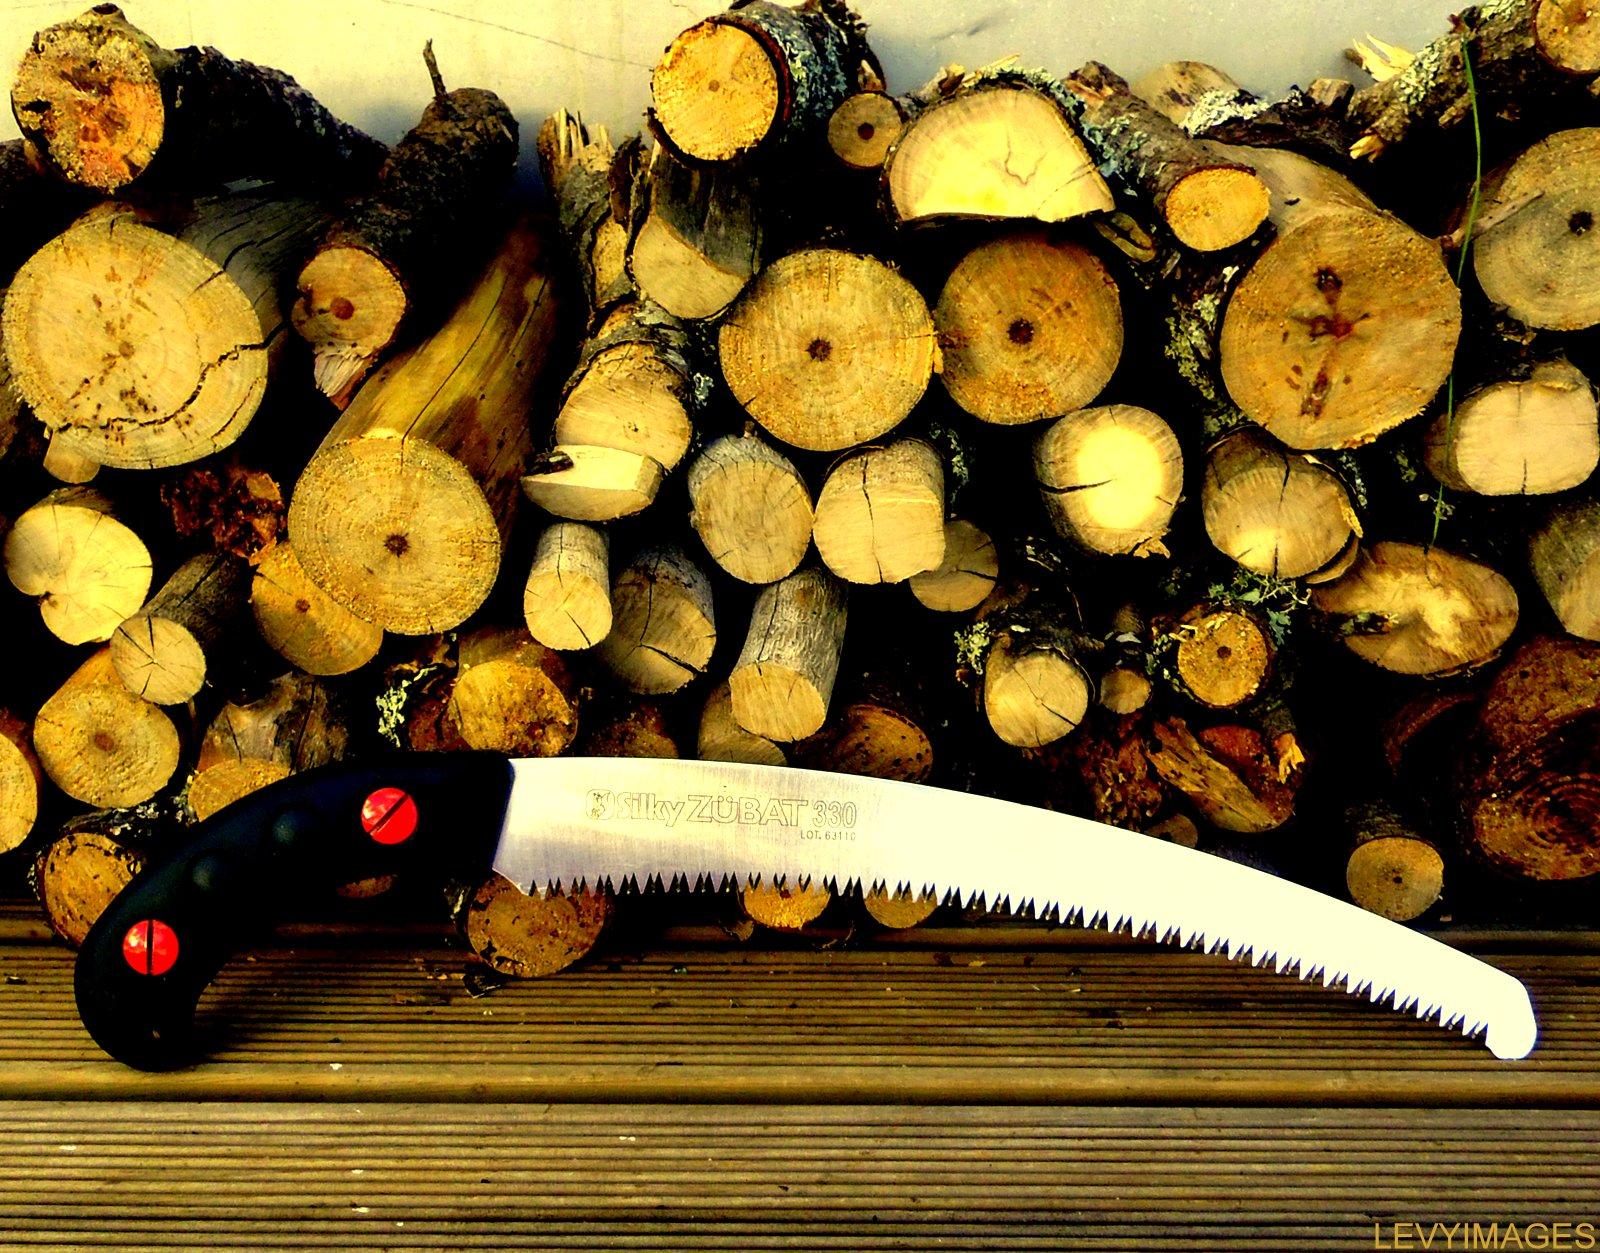 http://1.bp.blogspot.com/-T5Mvha9Cxb8/T6bgQ-zZI1I/AAAAAAAAEV4/w--mH0mzNPI/s1600/silky-zubat-pruning-saw-the-flying-tortoise-004.jpg